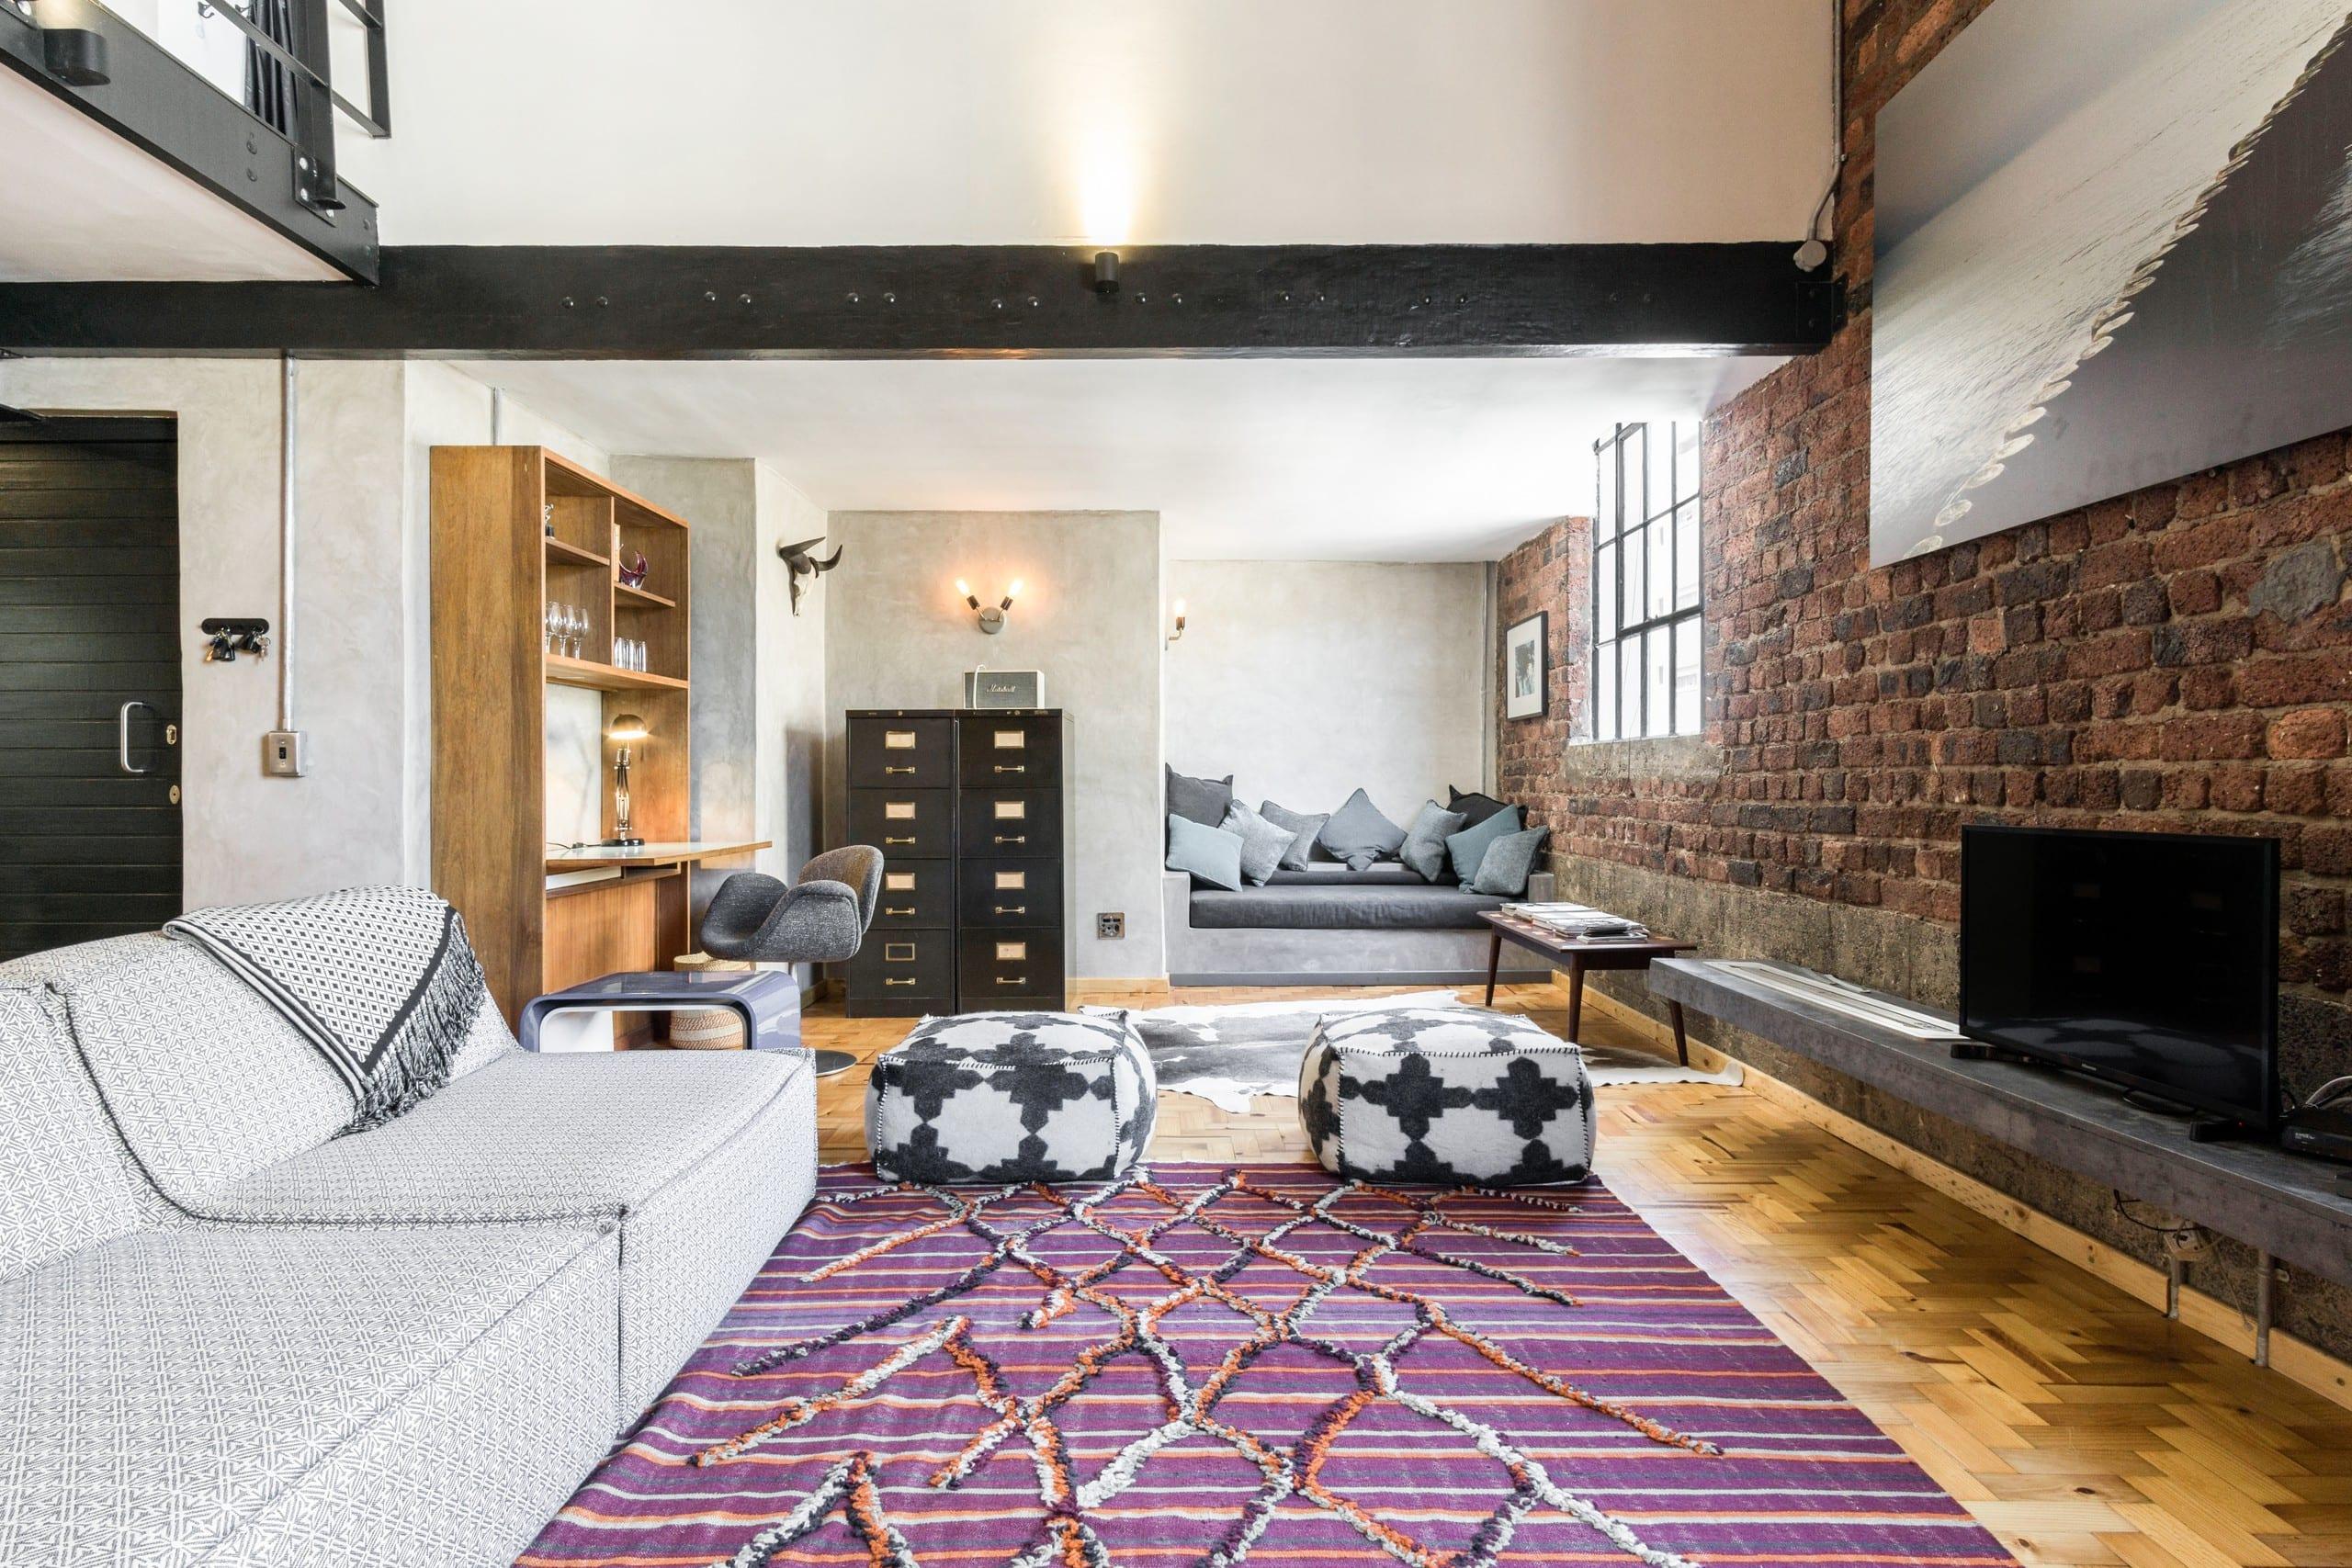 New York Style Loft Apartment in Cape Town City Center - Lofts zur ...